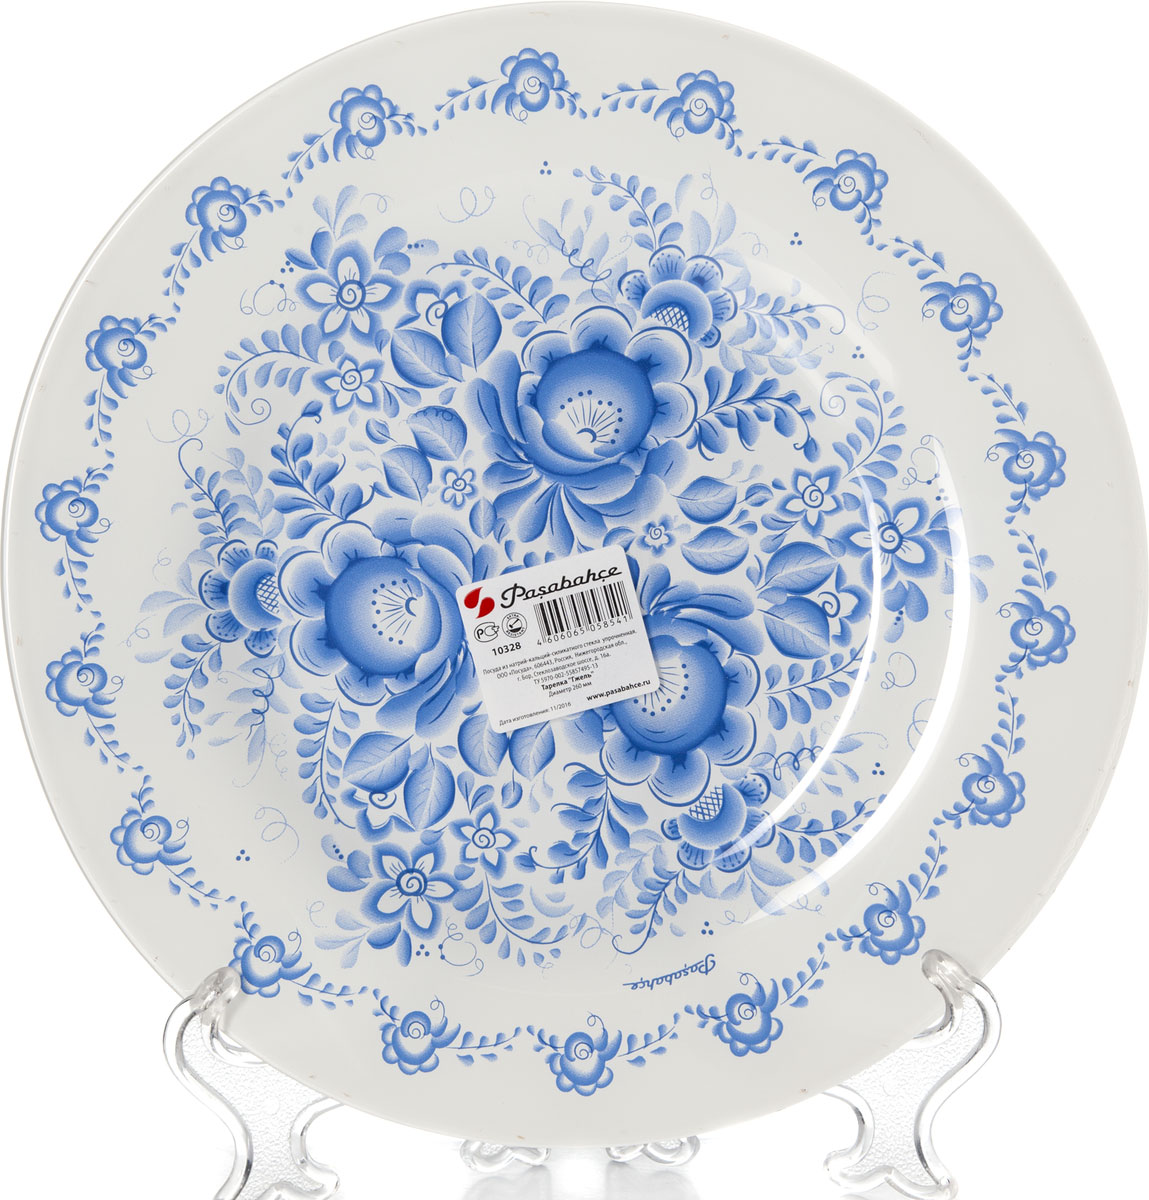 Тарелка обеденная Pasabahce Гжель, диаметр 26 см тарелка обеденная terracotta дерево жизни диаметр 26 см